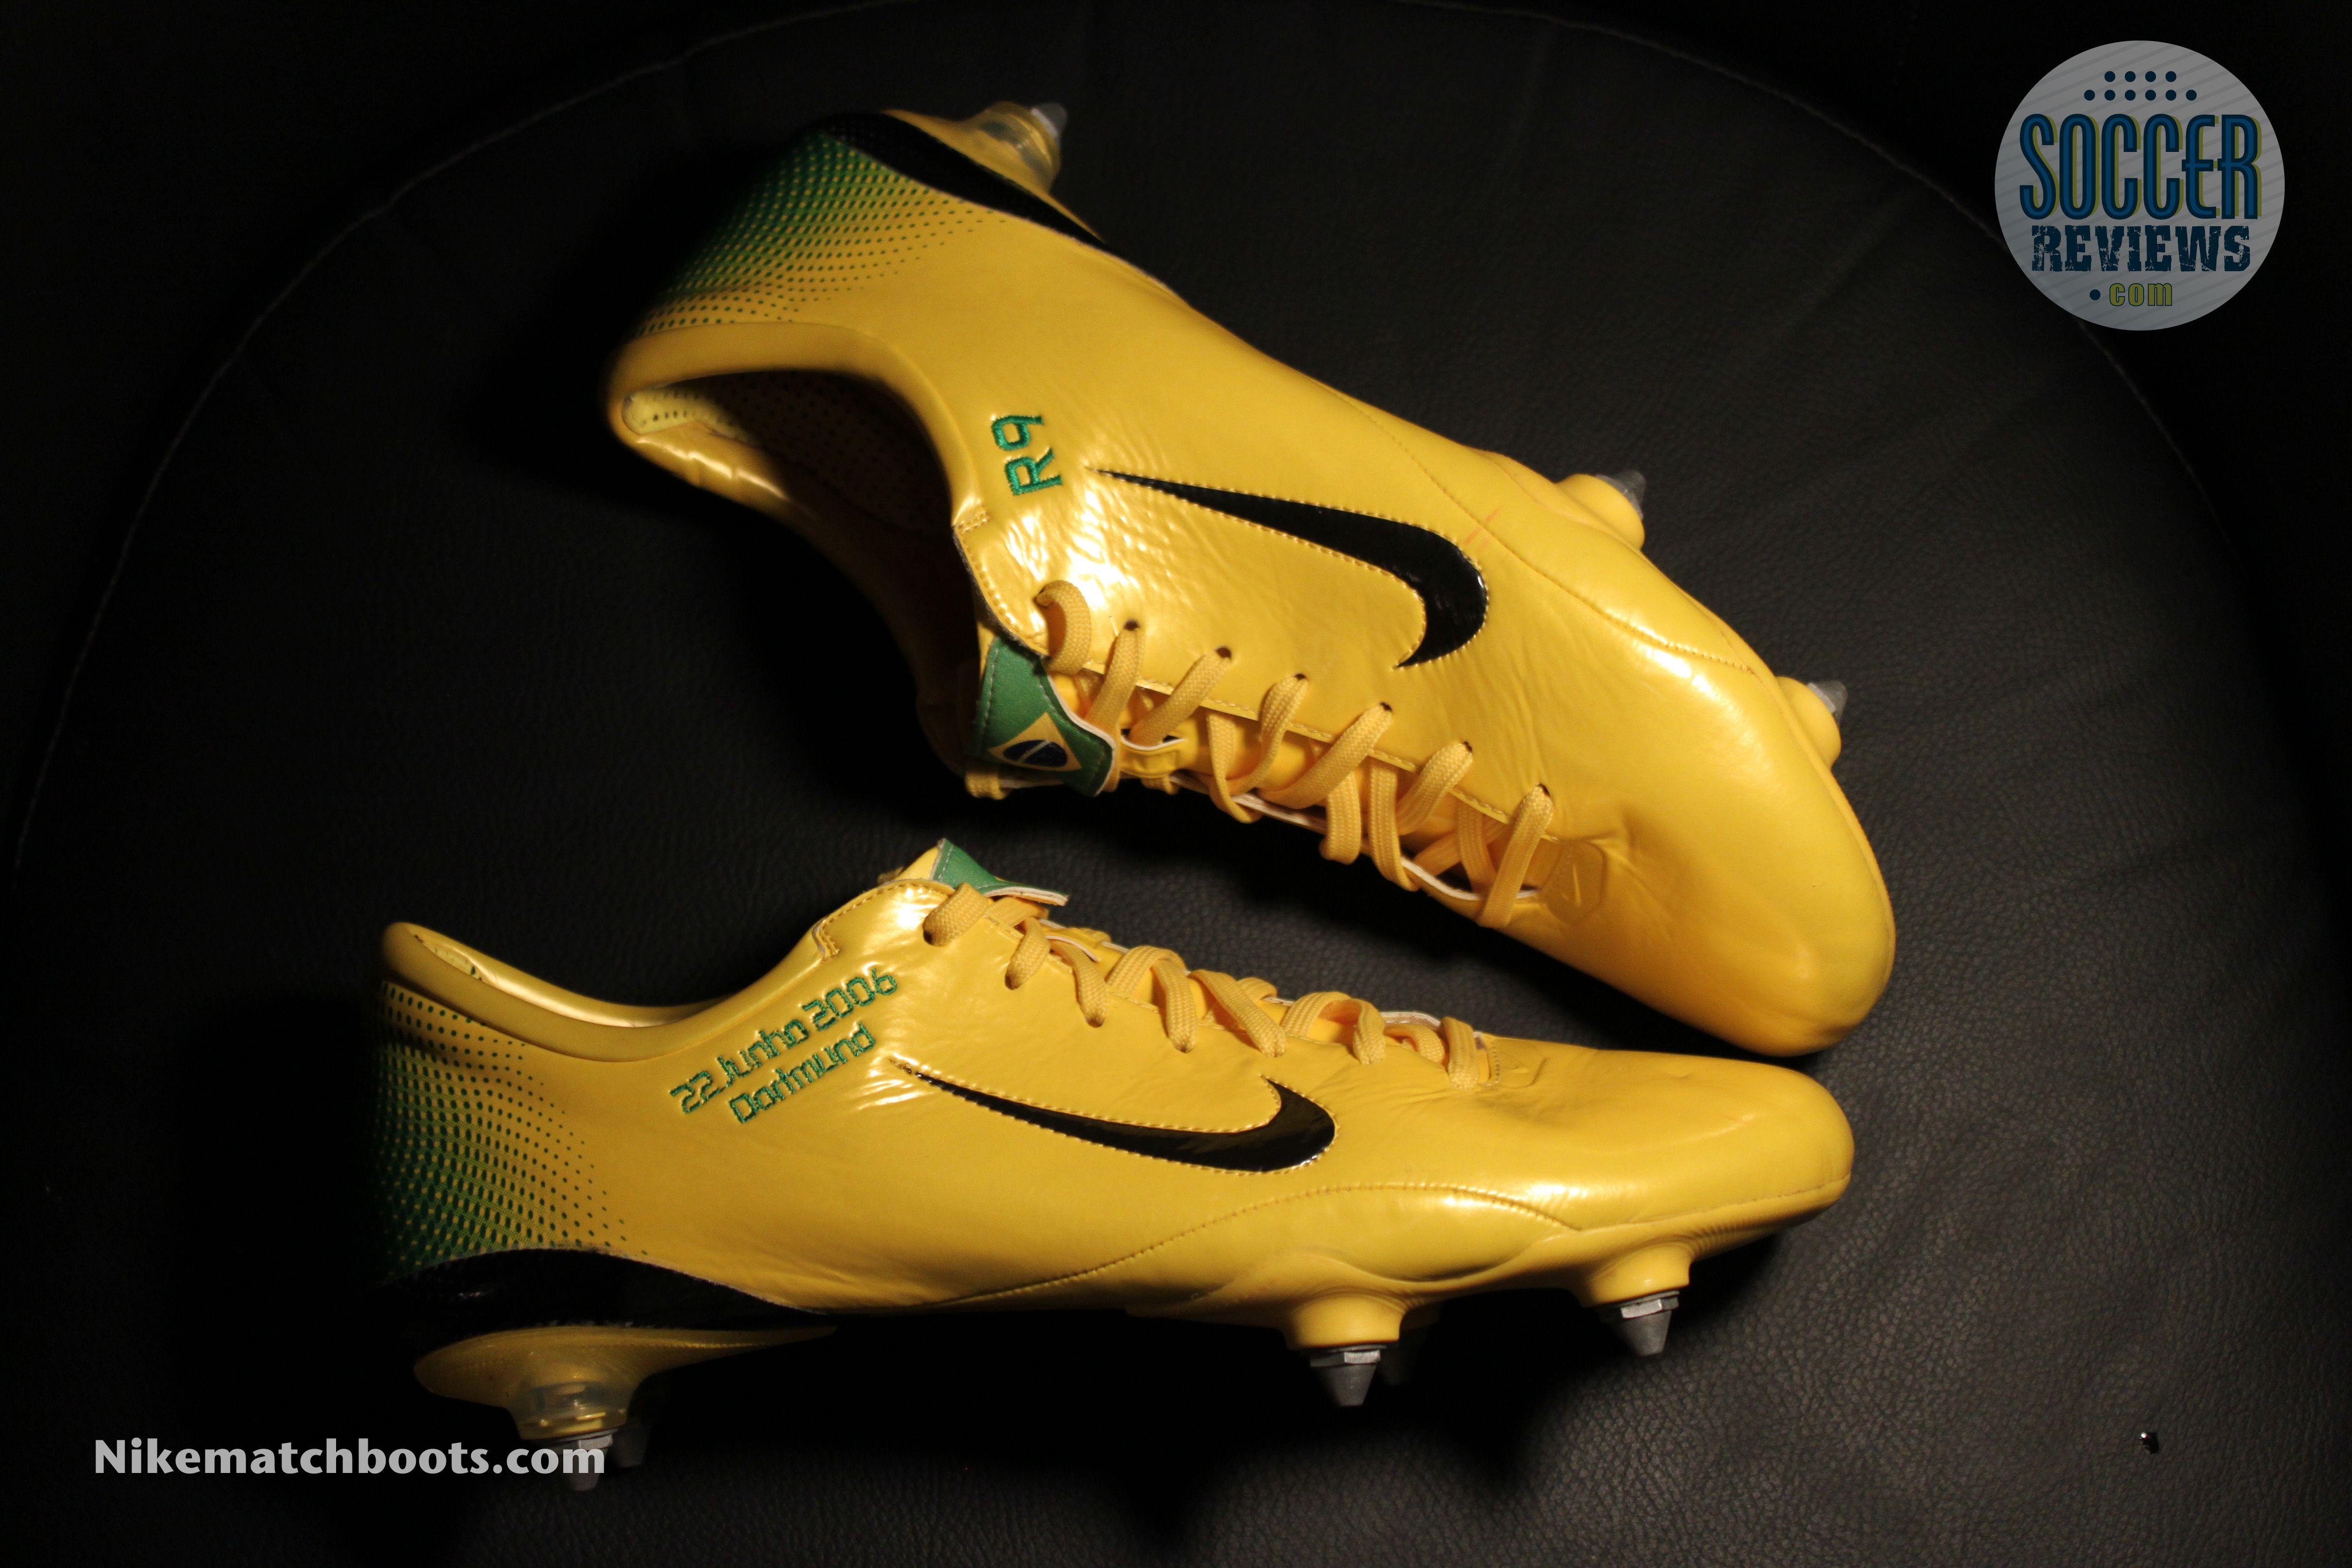 2006 GoogleSukan Pesquisa Mercurial Soccer Nike Cleats wXZukOPTi